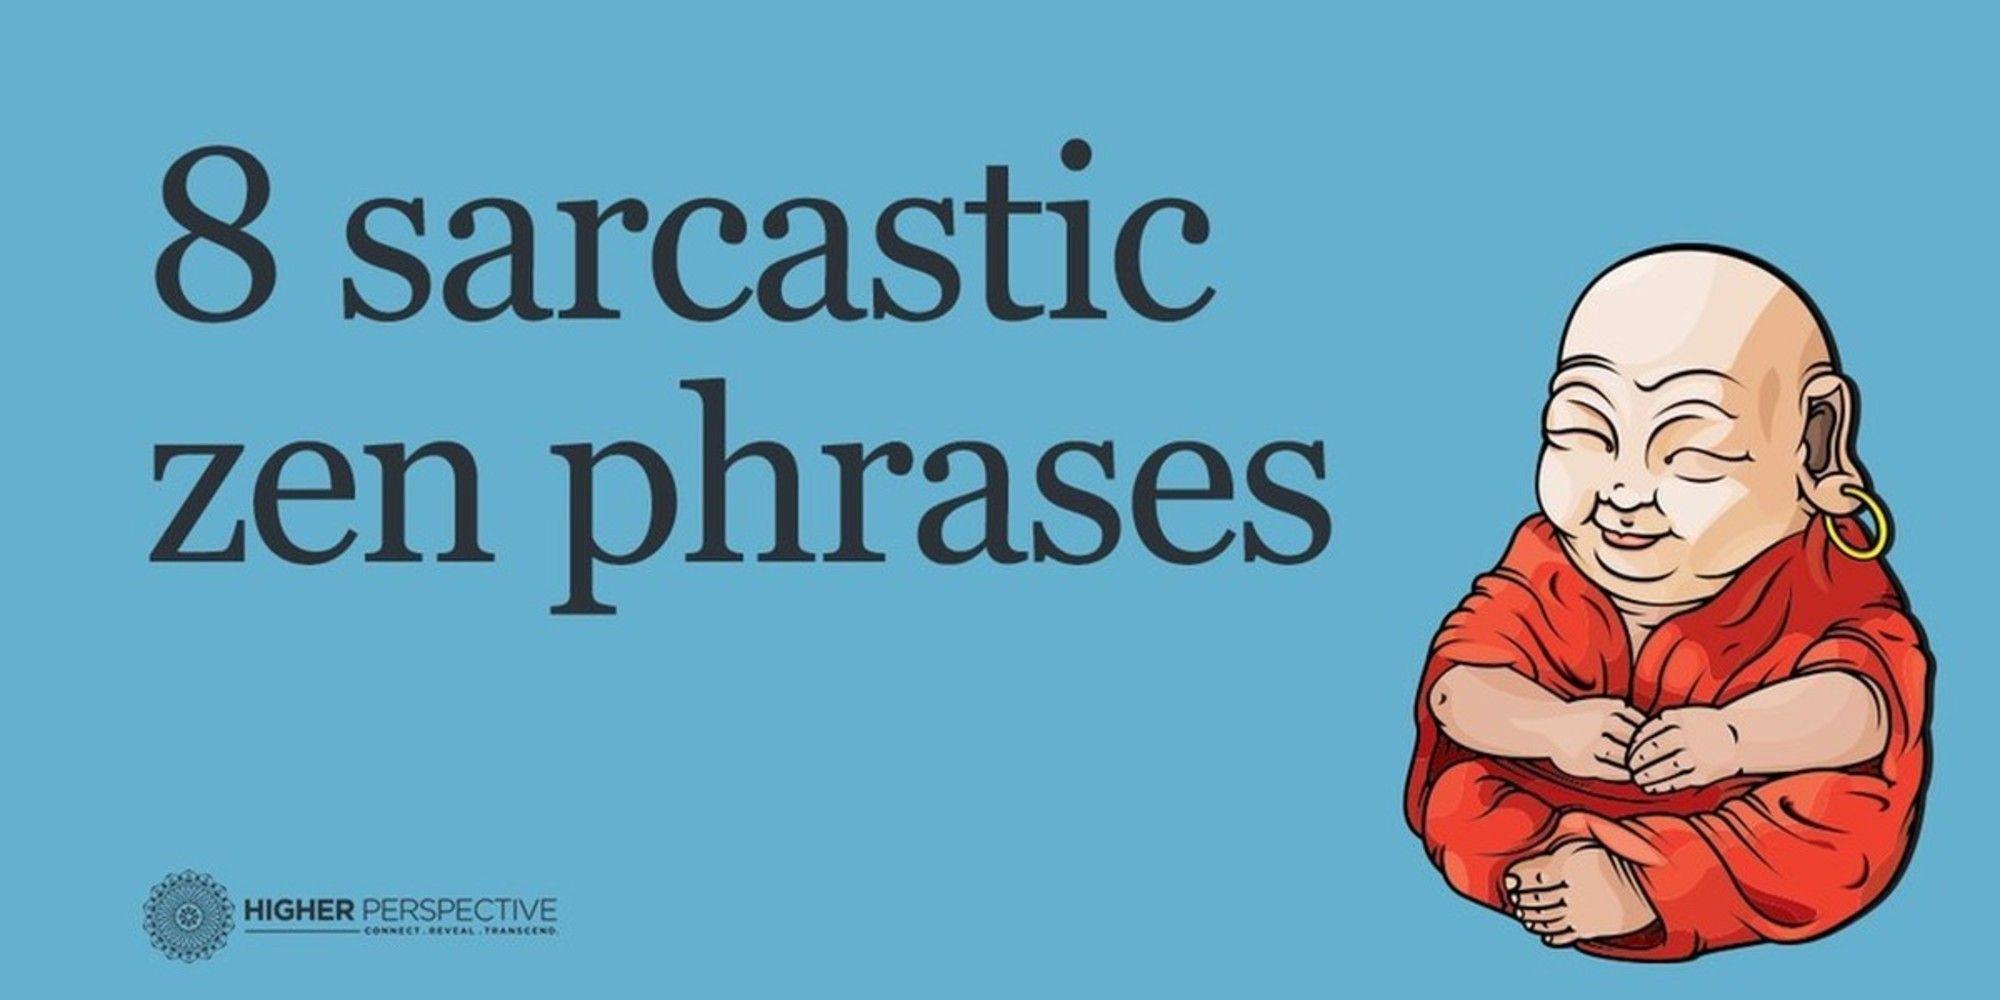 8 Sarcastic Zen Phrases Philosophy Quotes Deep Zen Quotes Sarcastic Quotes